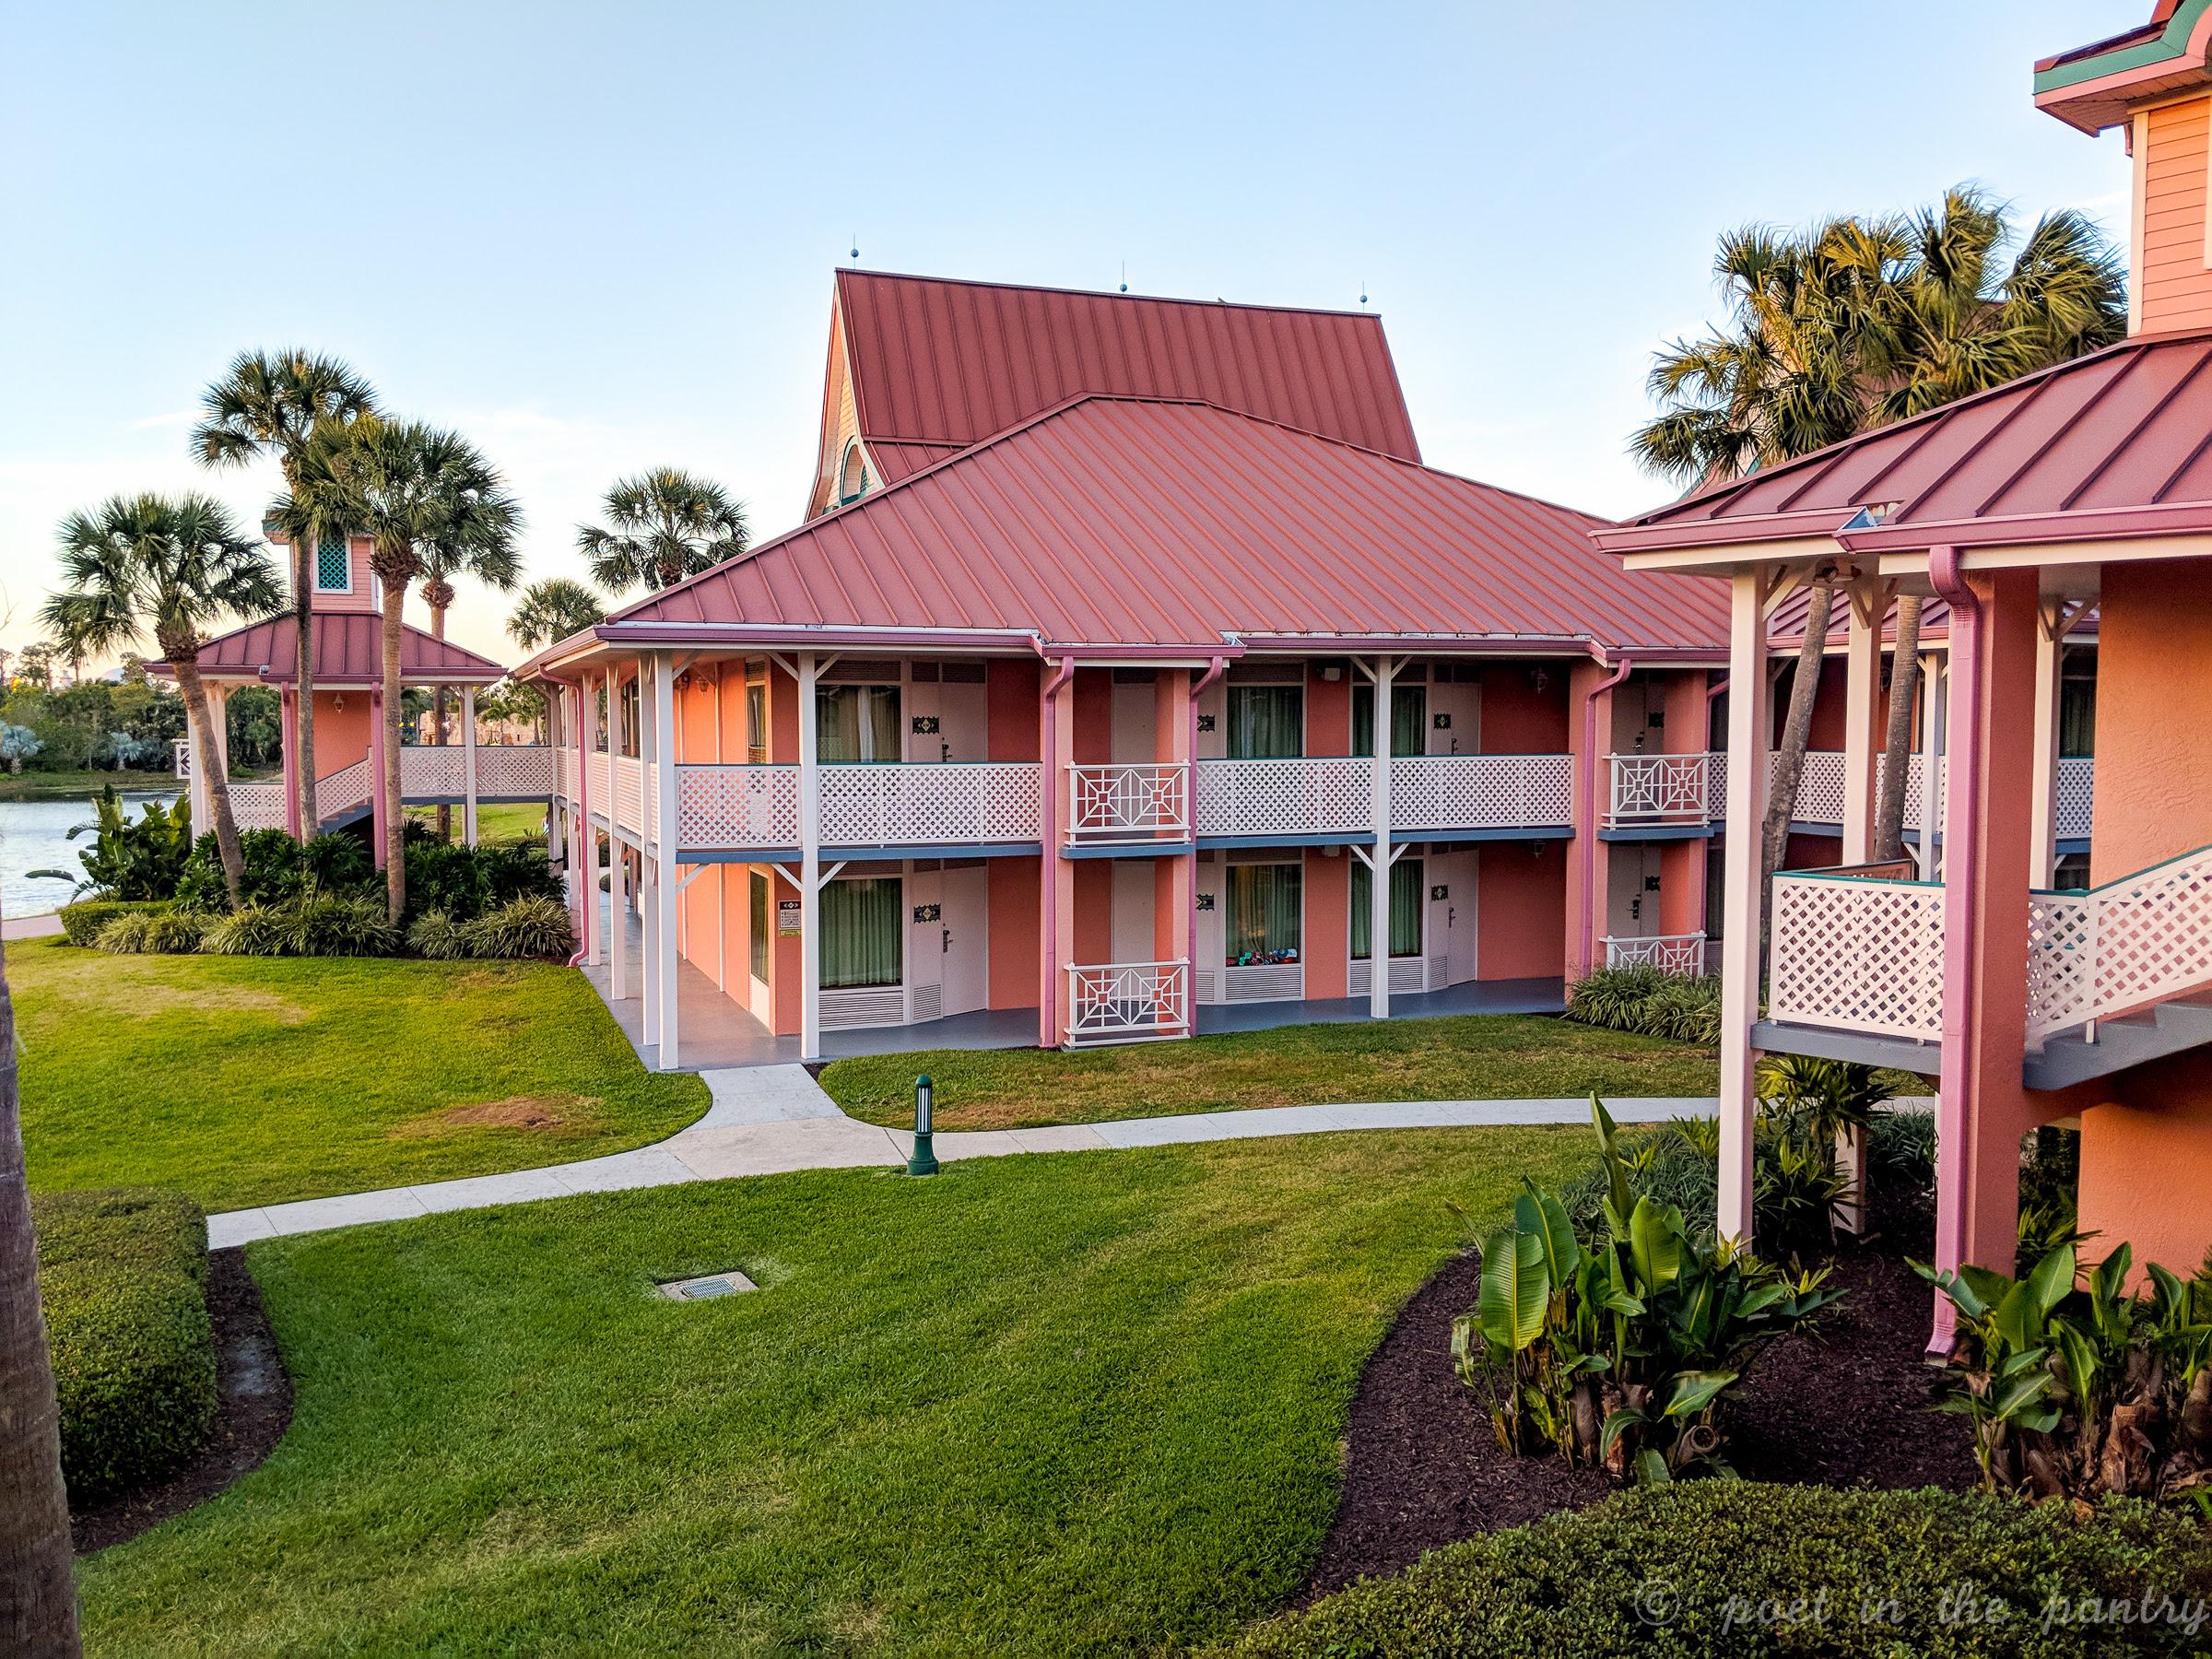 Travel Disneys Caribbean Beach Resort 2018  Poet in the